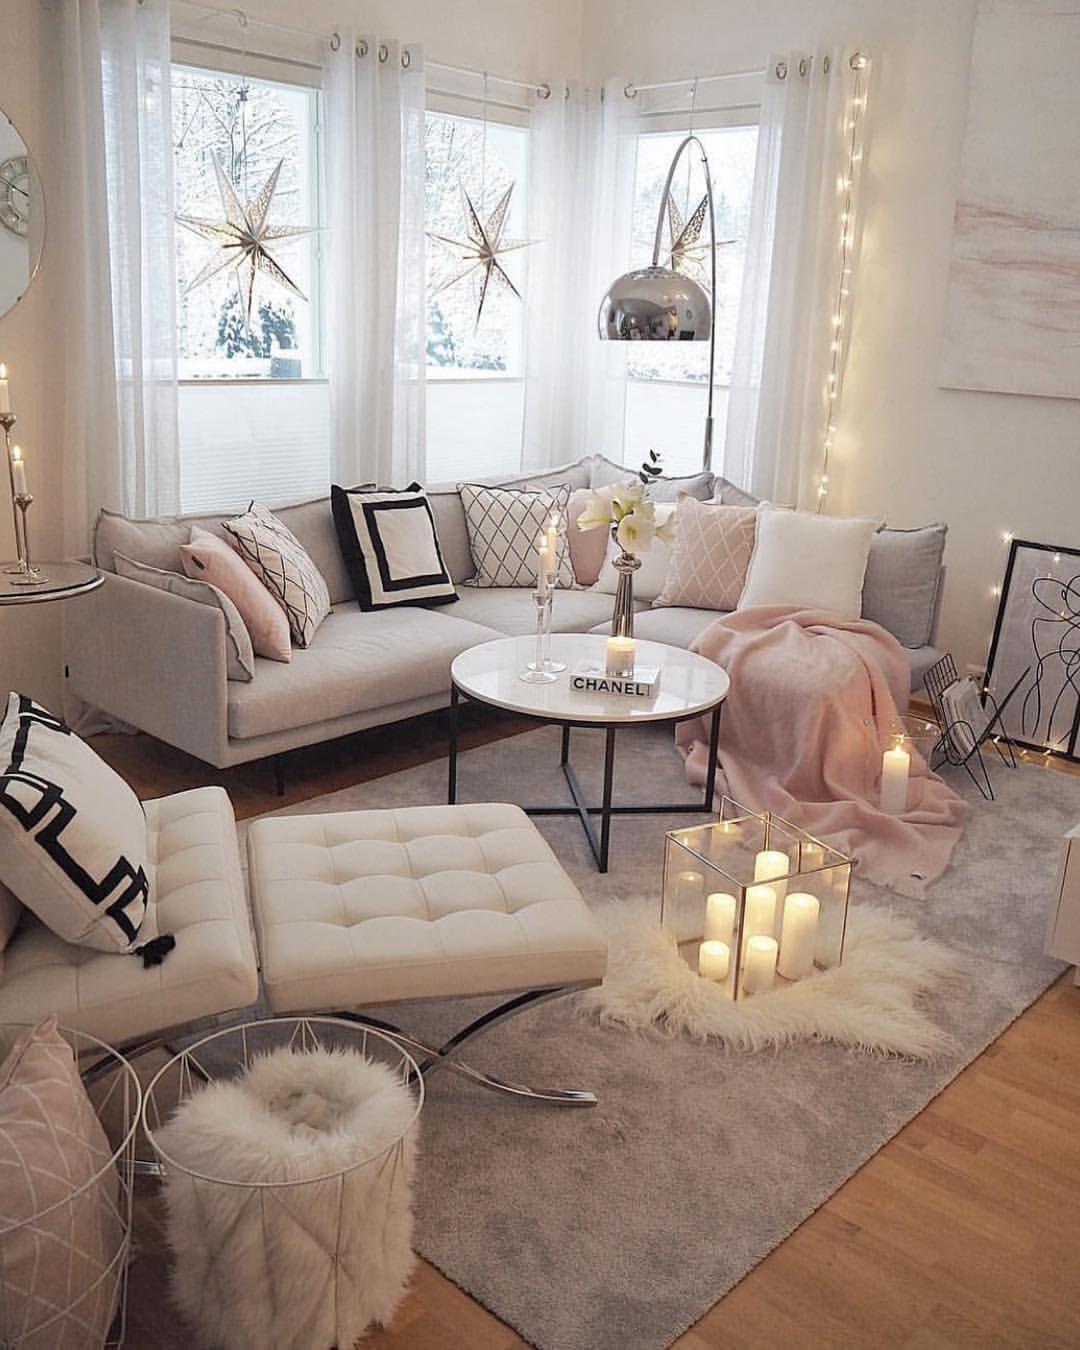 21 Me Gusta 0 Comentarios Interior Design Home Decor Interior Today En Instagra Winter Living Room Winter Living Room Decor Living Room Decor Apartment #winter #living #room #ideas